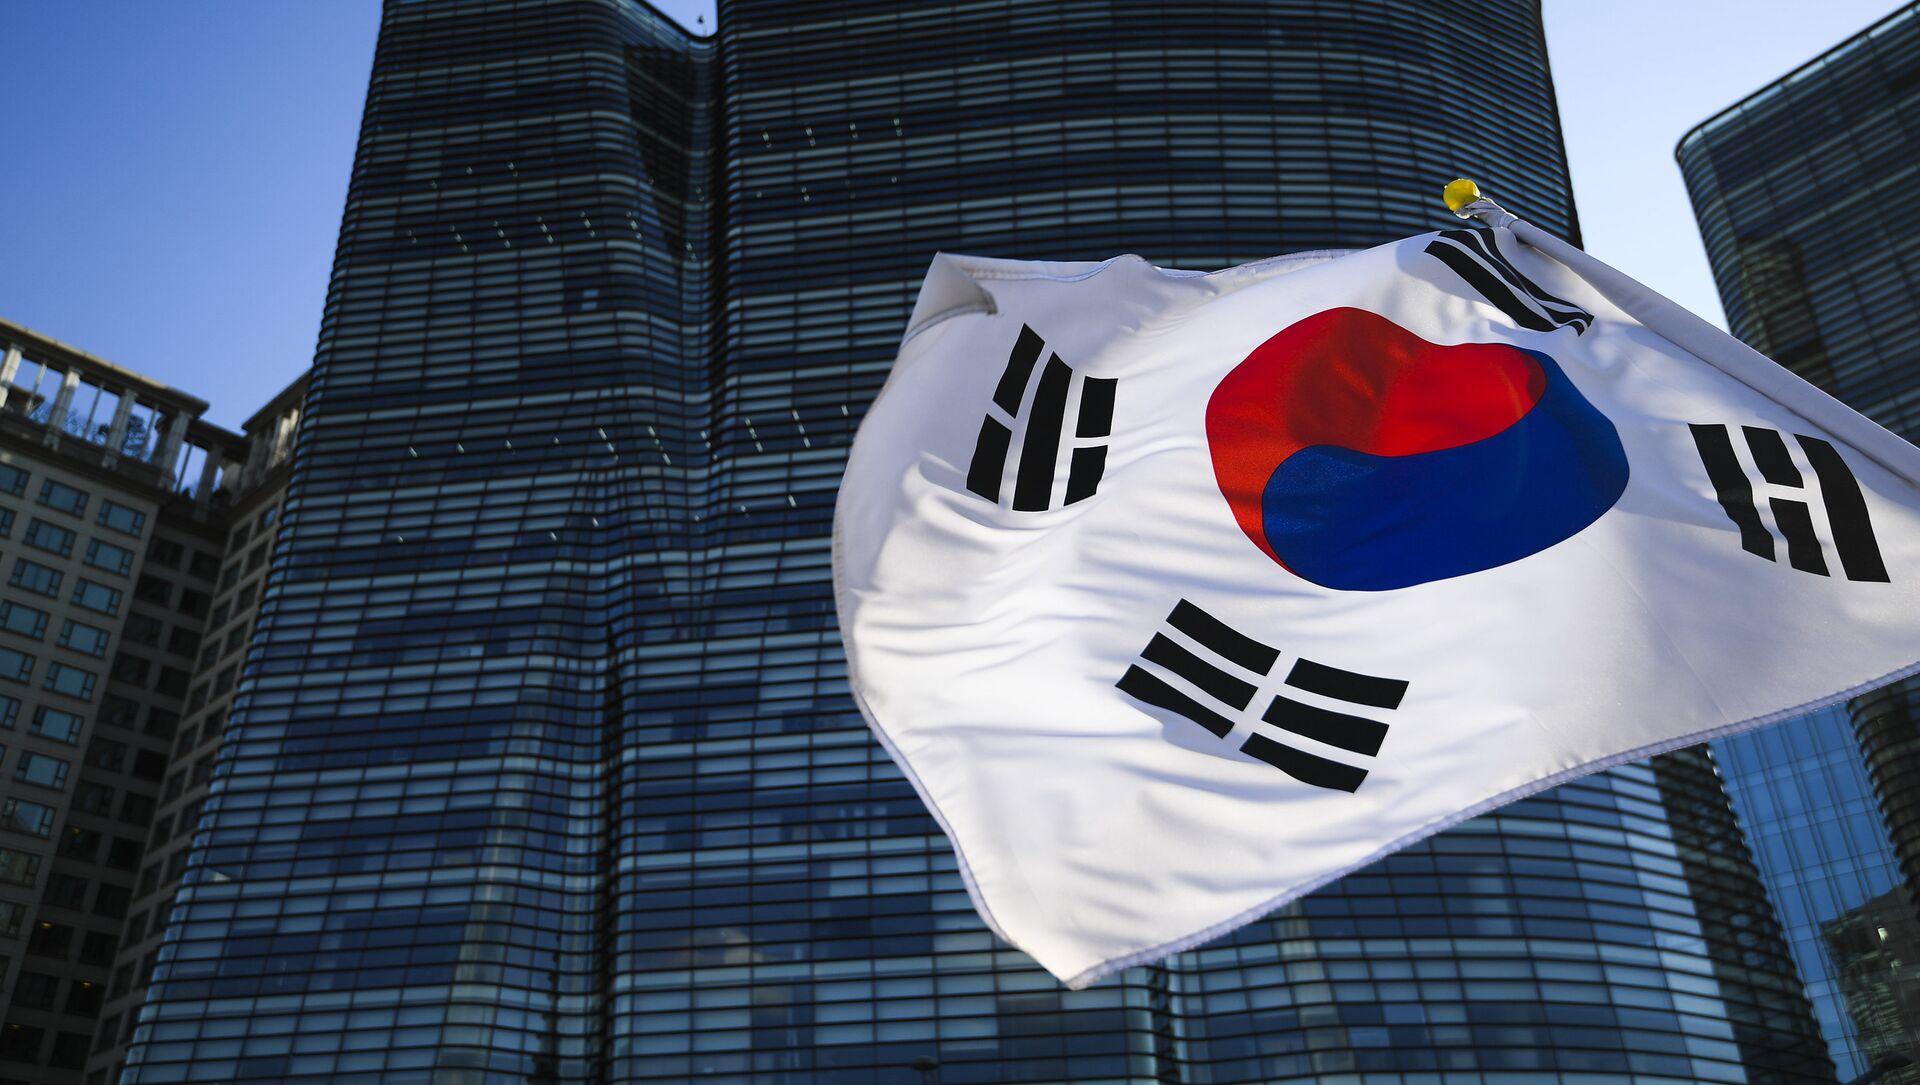 The Republic of Korea flag in Seoul - Sputnik International, 1920, 29.07.2021